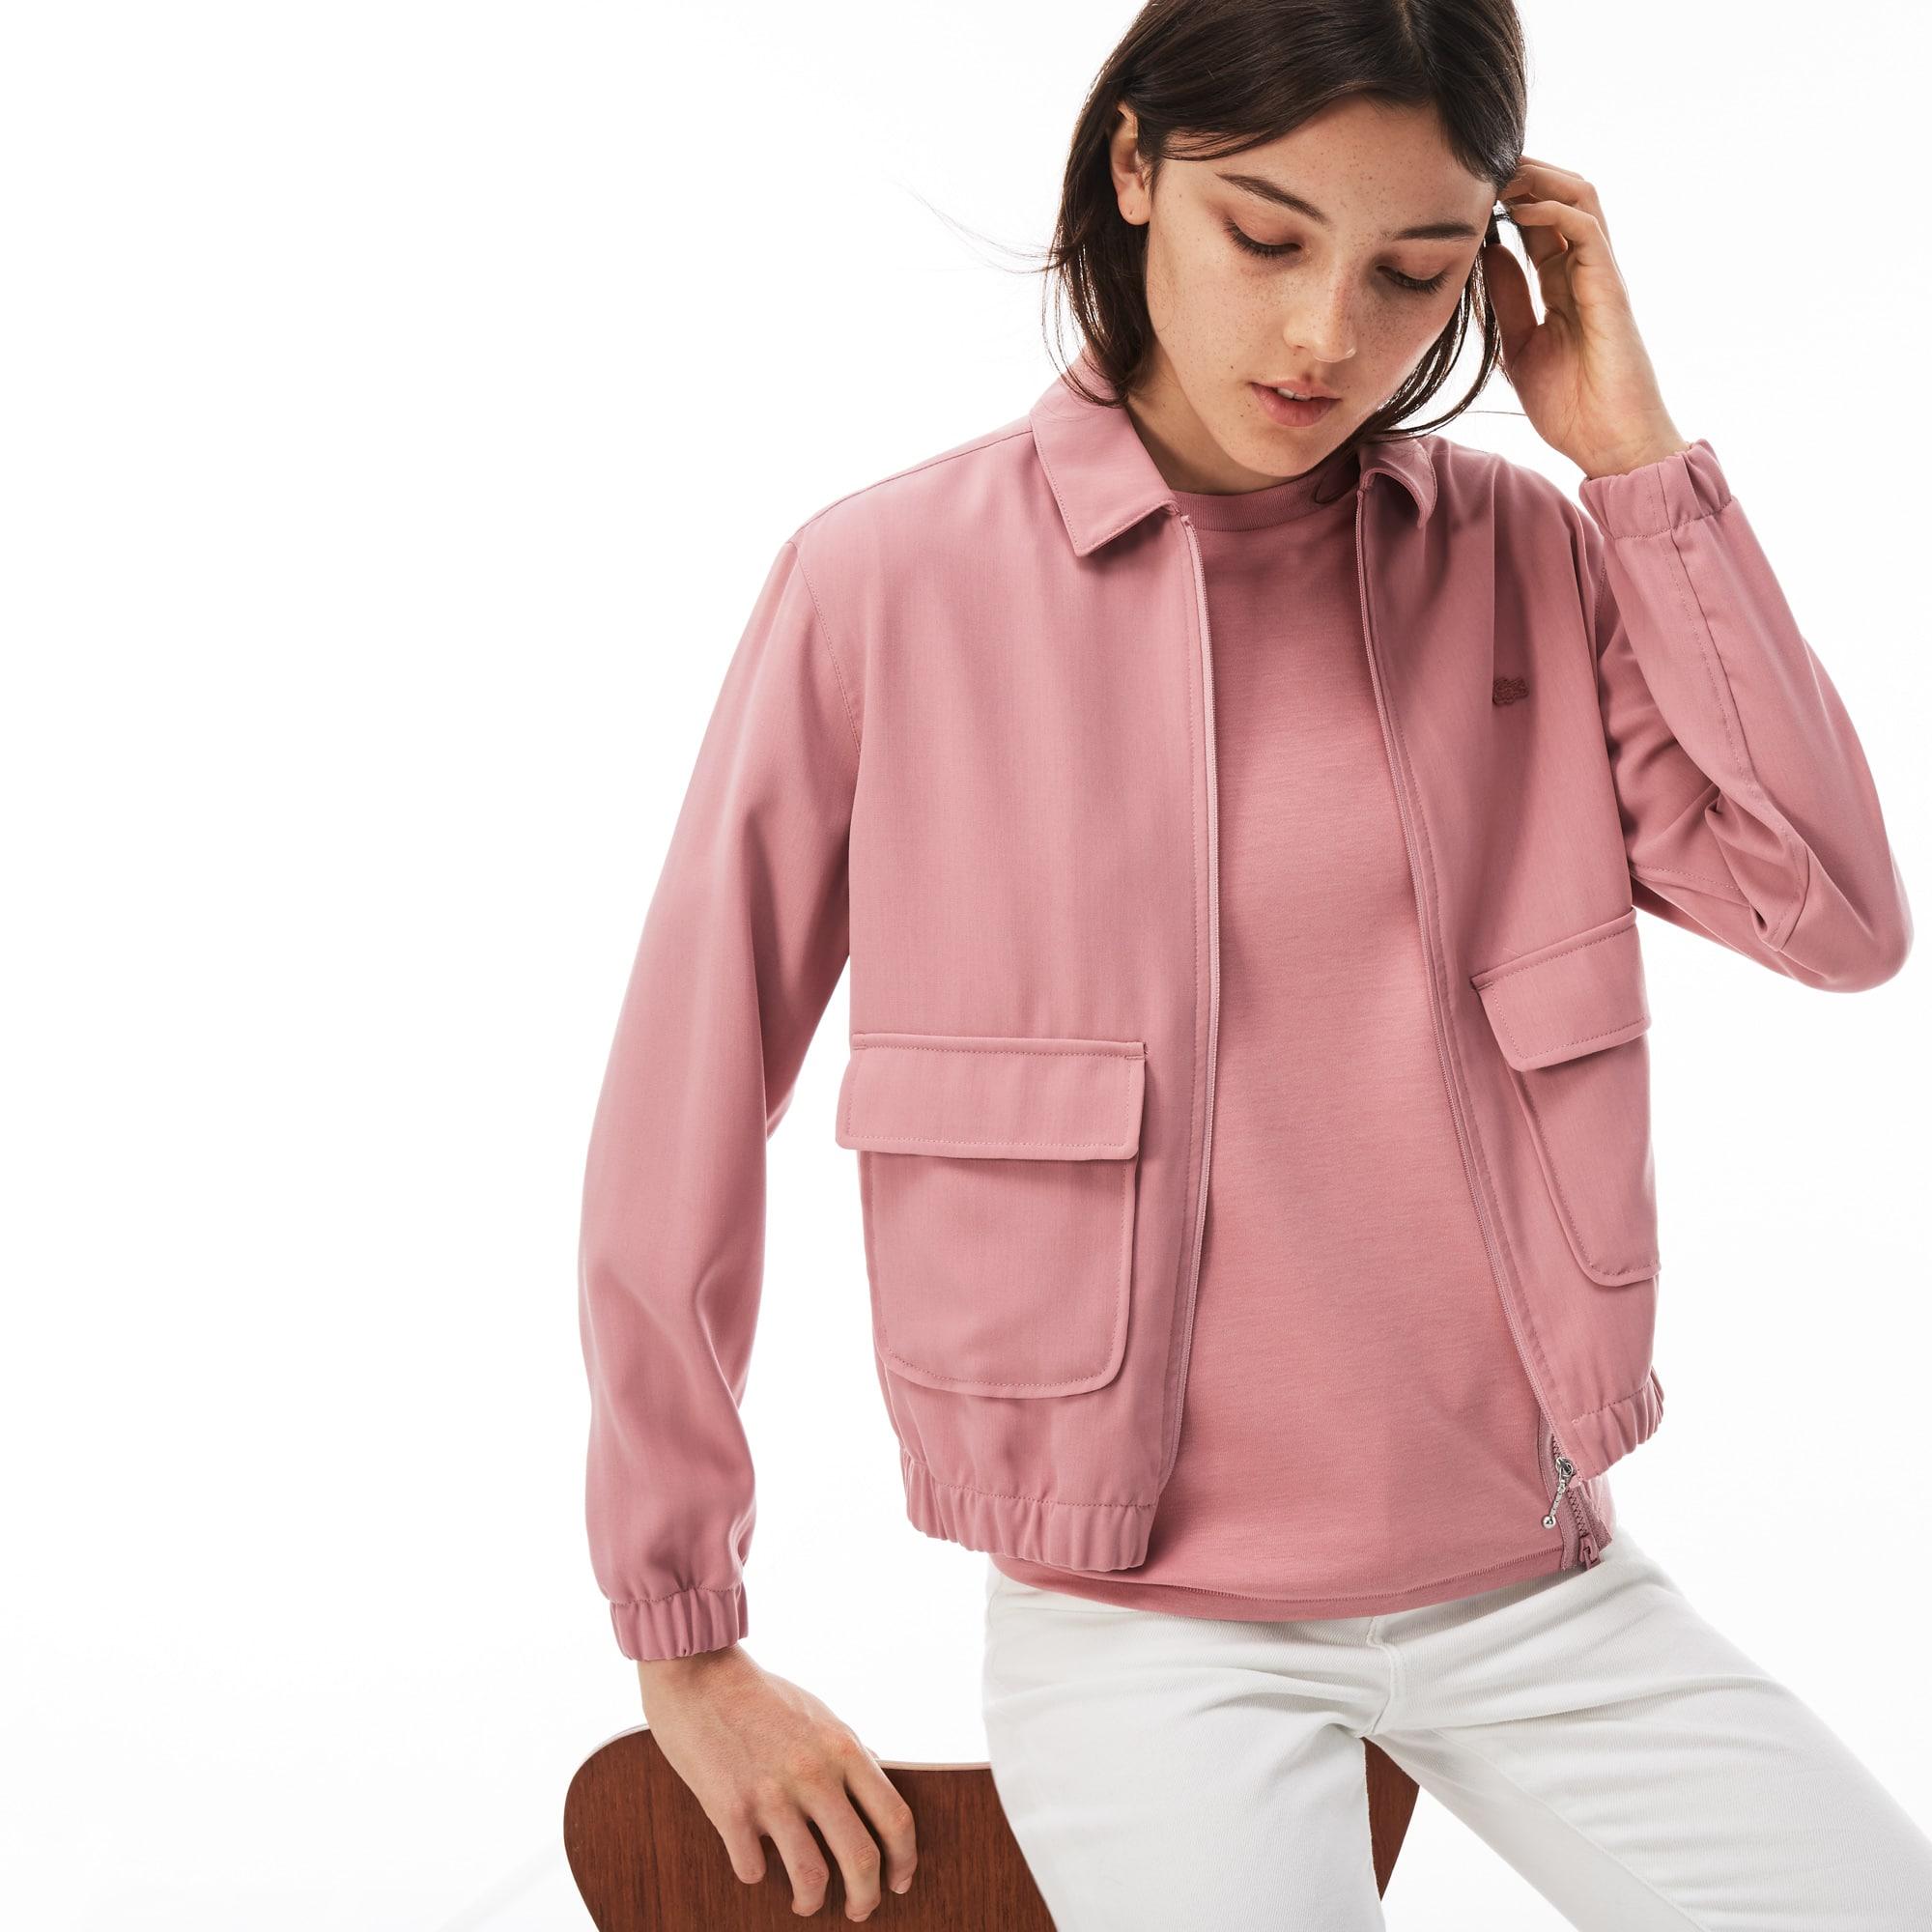 Kurze Damen-Jacke aus Krepp mit Reißverschluss LACOSTE L!VE